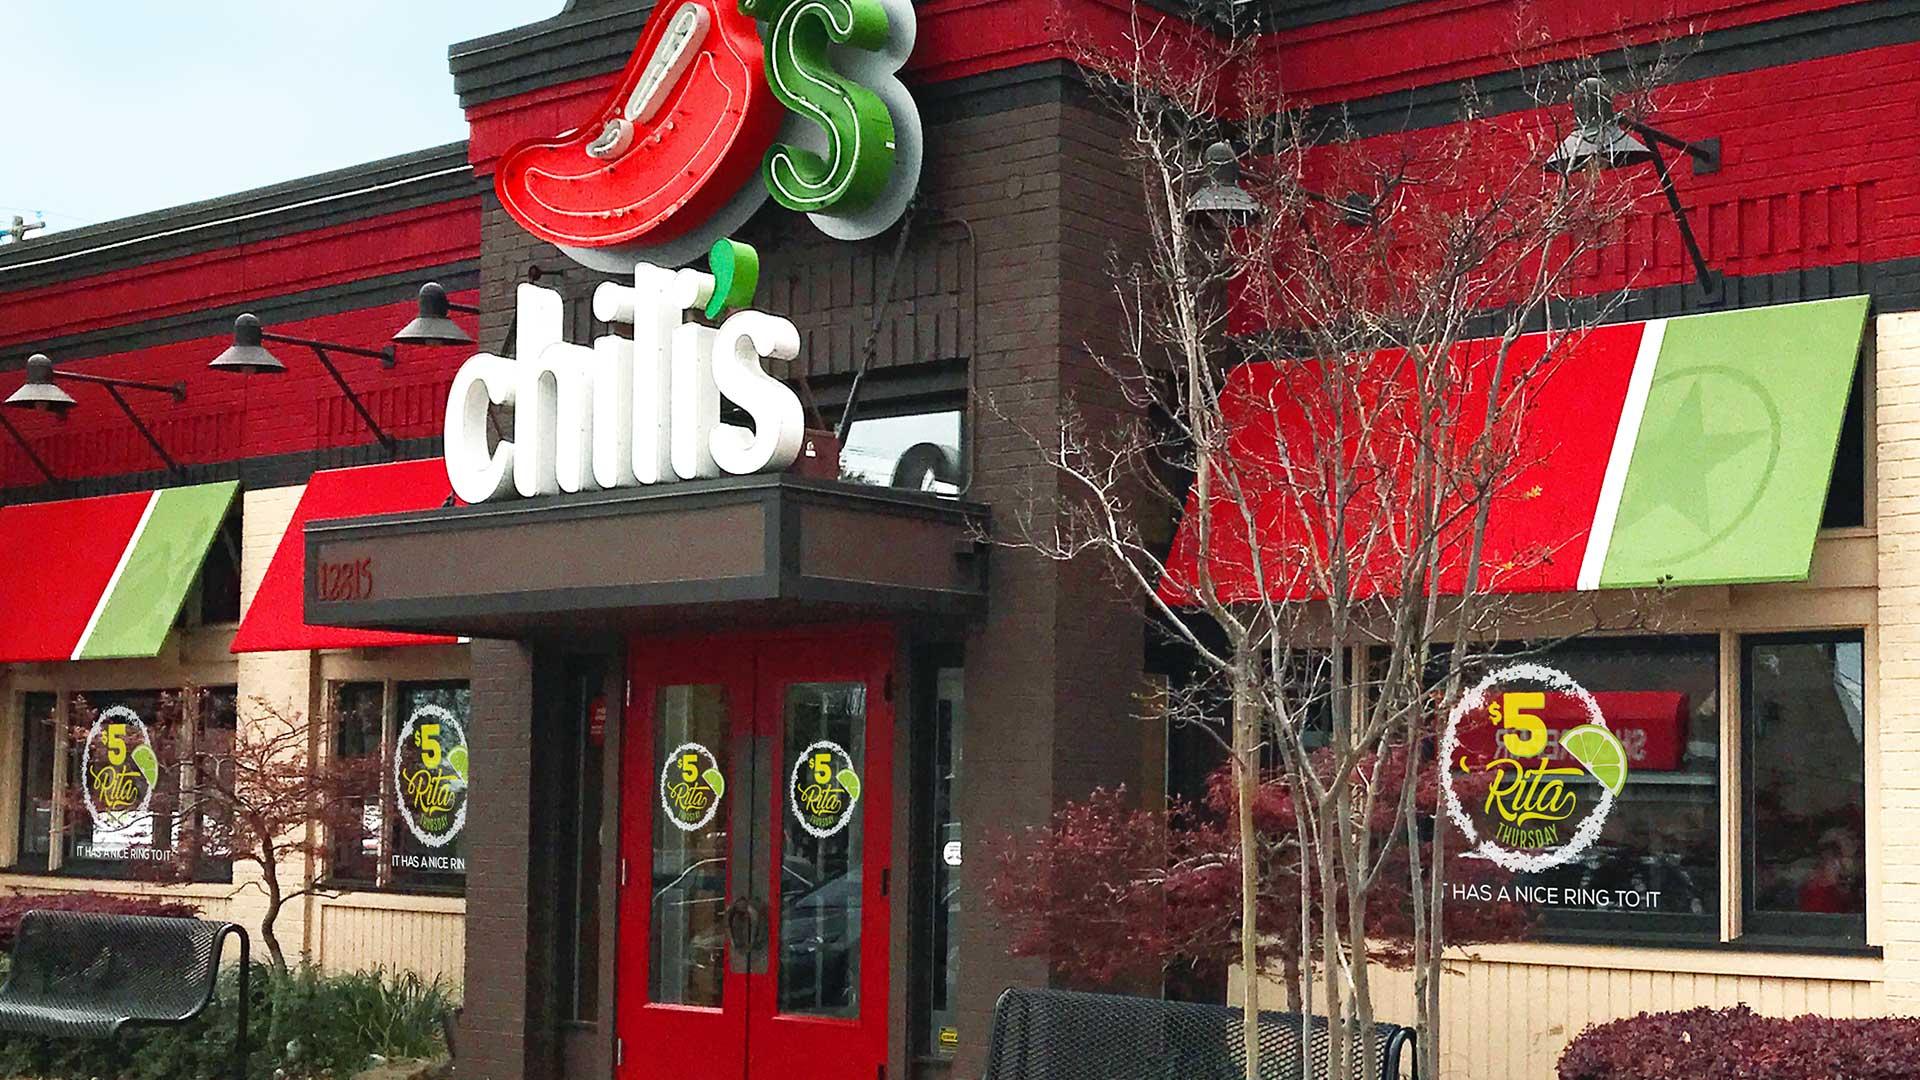 chilis-rita-thursday-point-of-sale